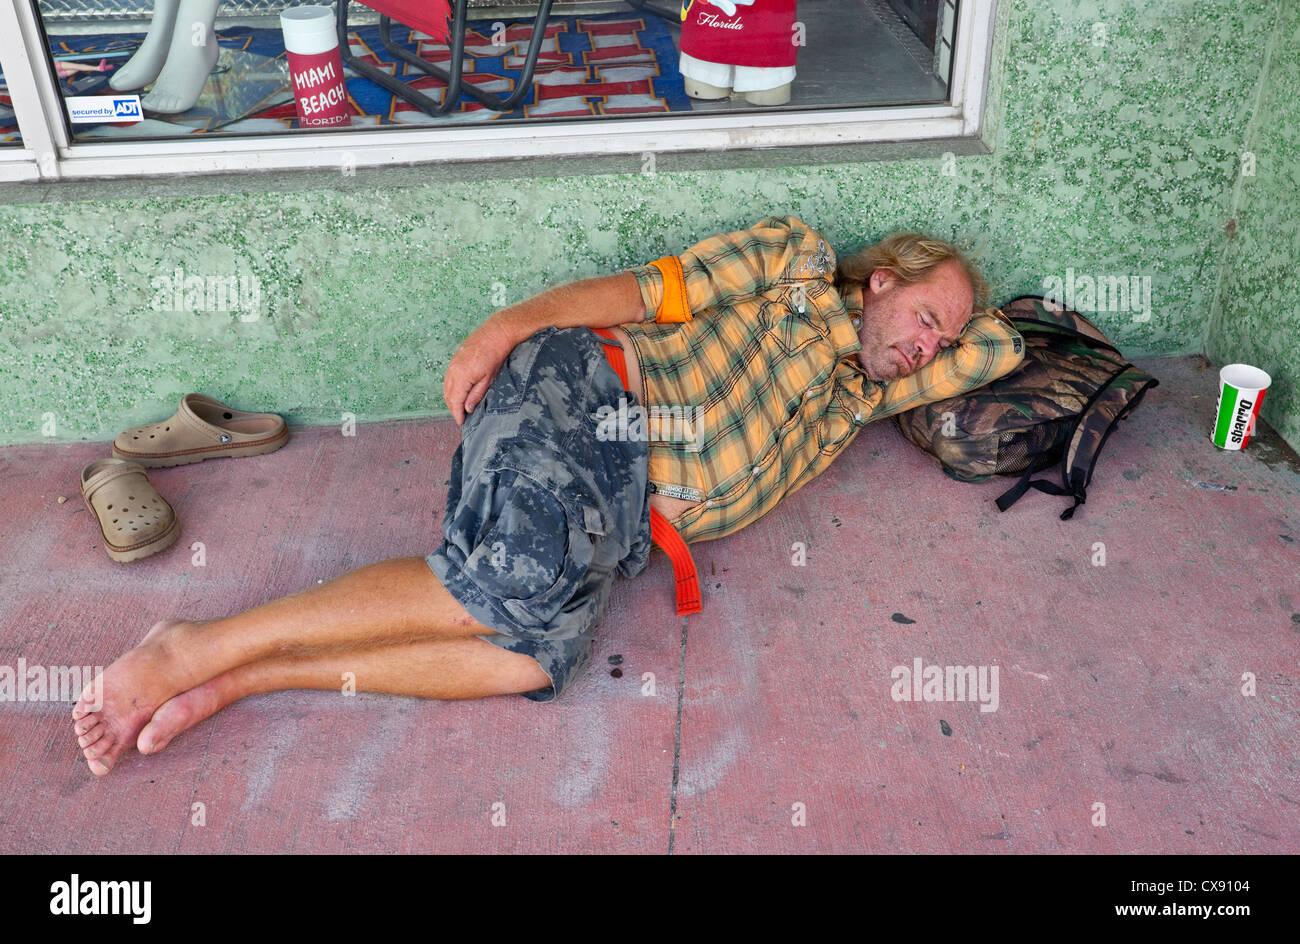 Homeless man sleeping rough, Lincoln Road, South Beach, Miami Beach, Florida, USA - Stock Image